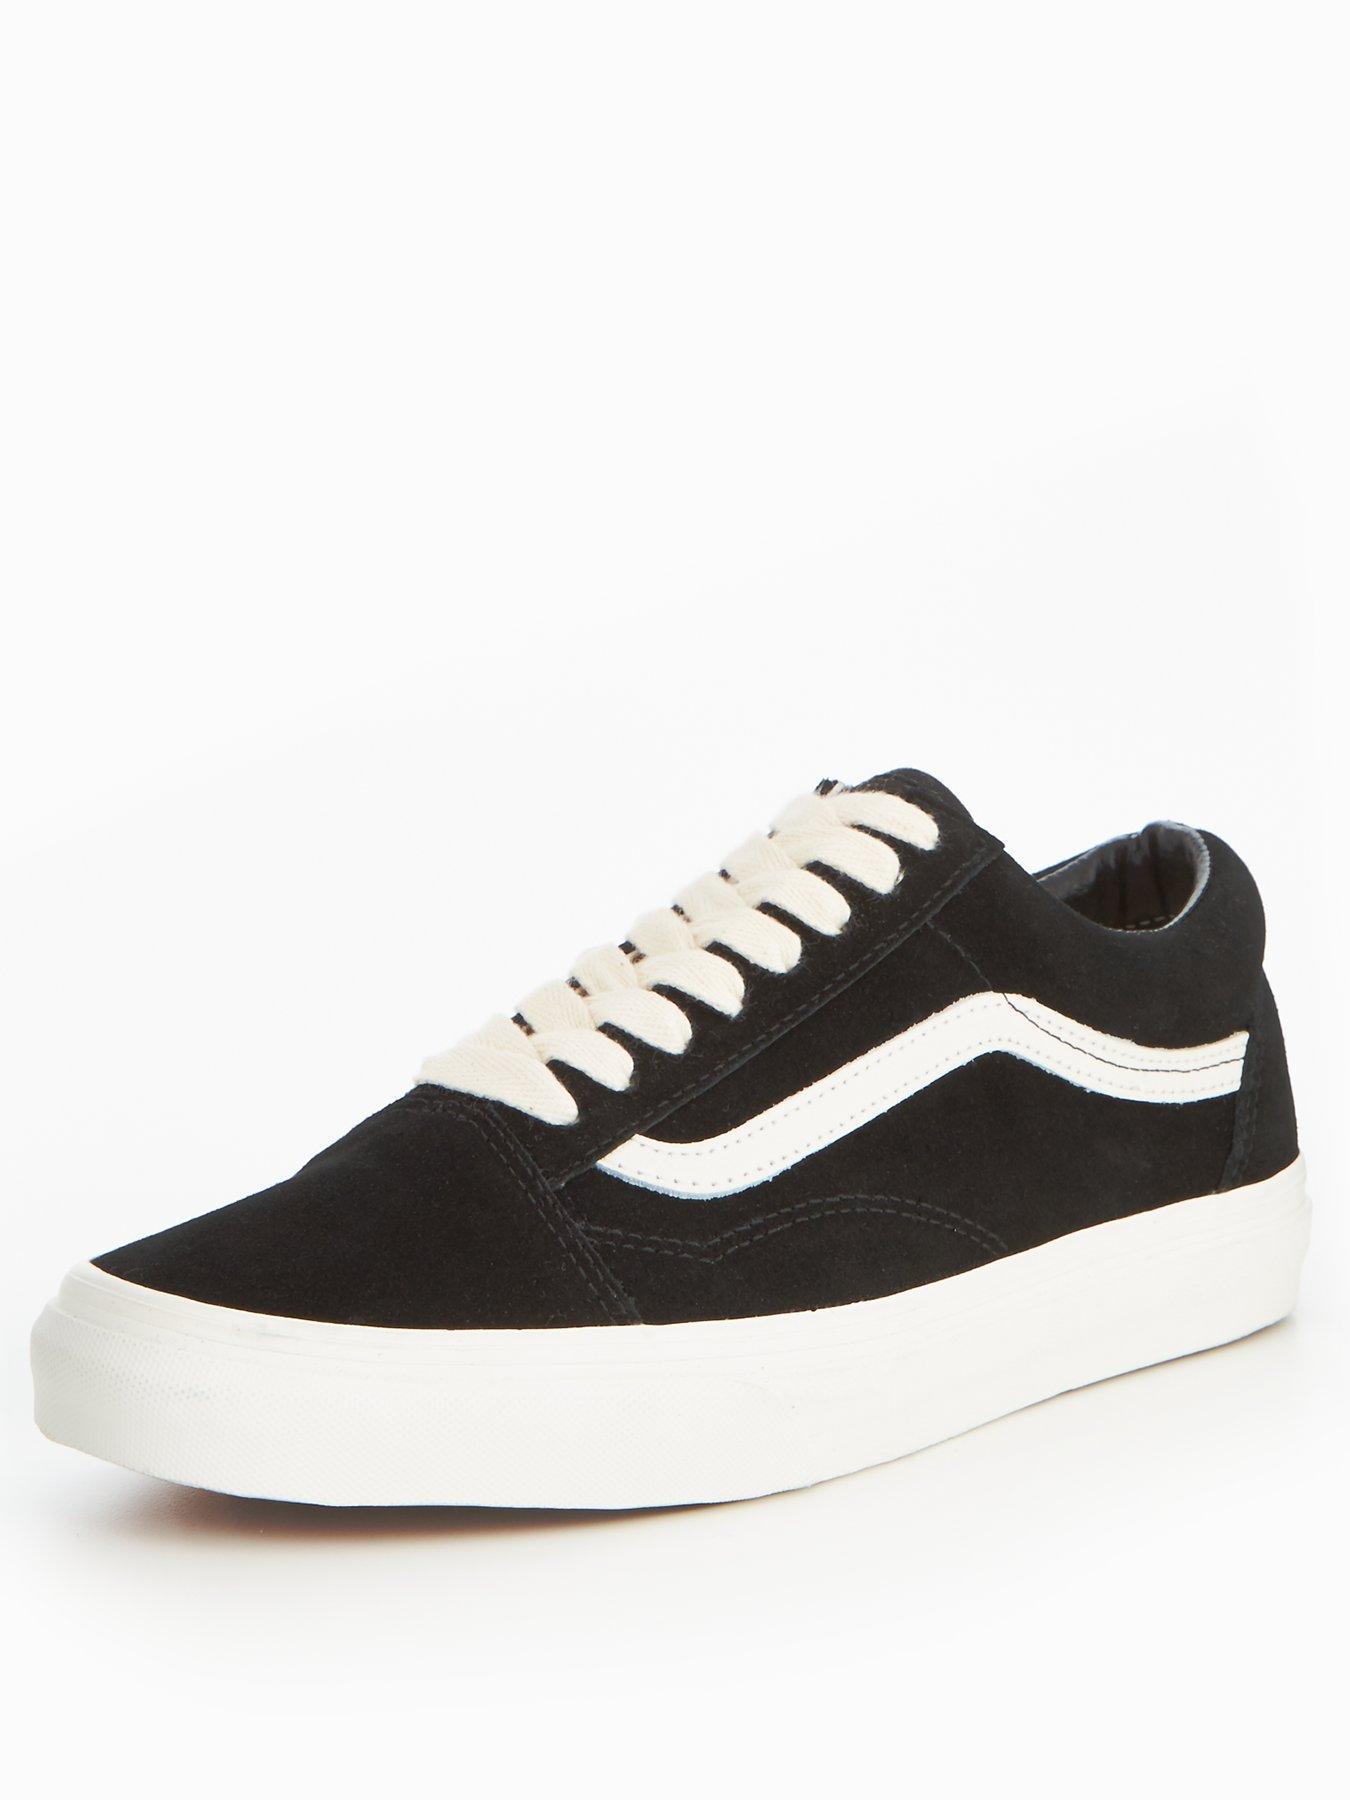 Vans Ua Old Skool 1600184285 Men's Shoes Vans Pumps Plimsolls